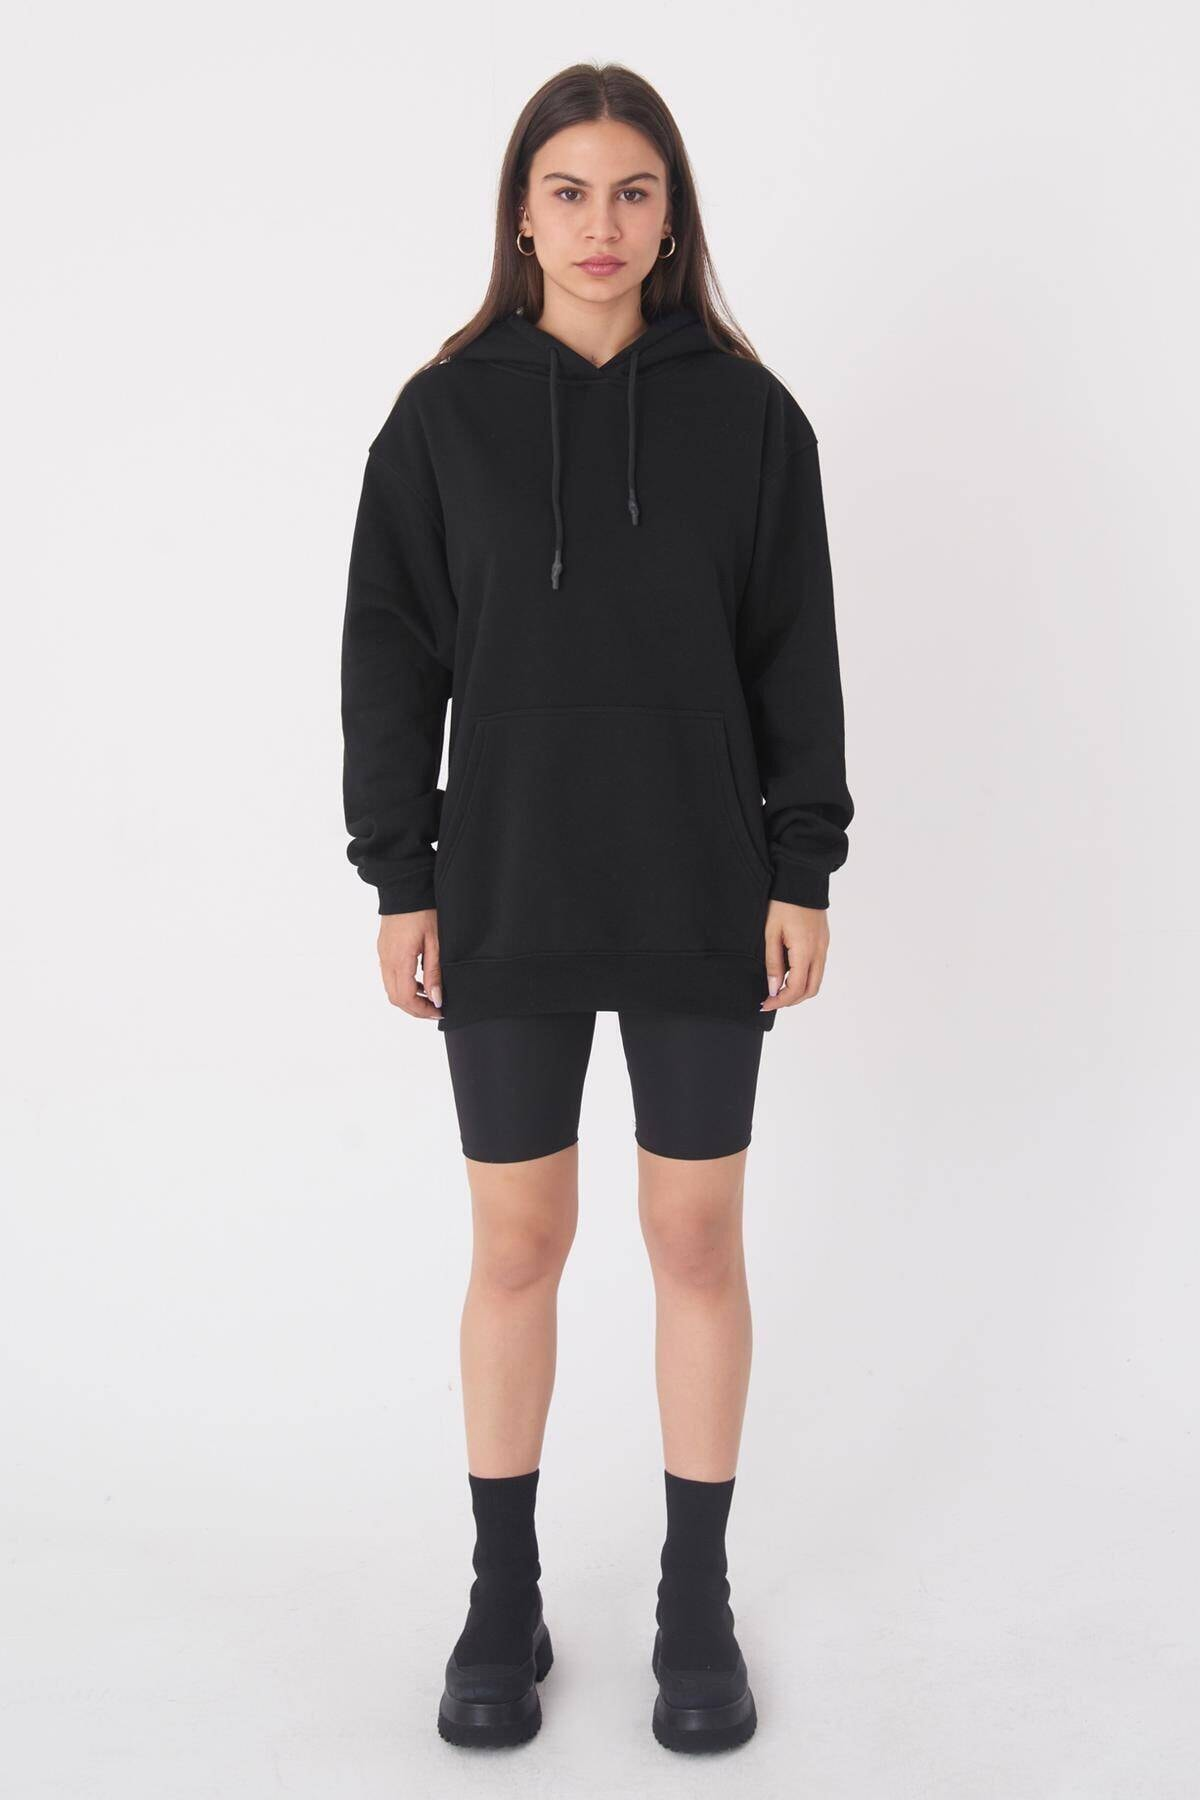 Addax Kadın Siyah Kapüşonlu Oversize Sweat S0925 - N4 - P3 ADX-0000022256 1